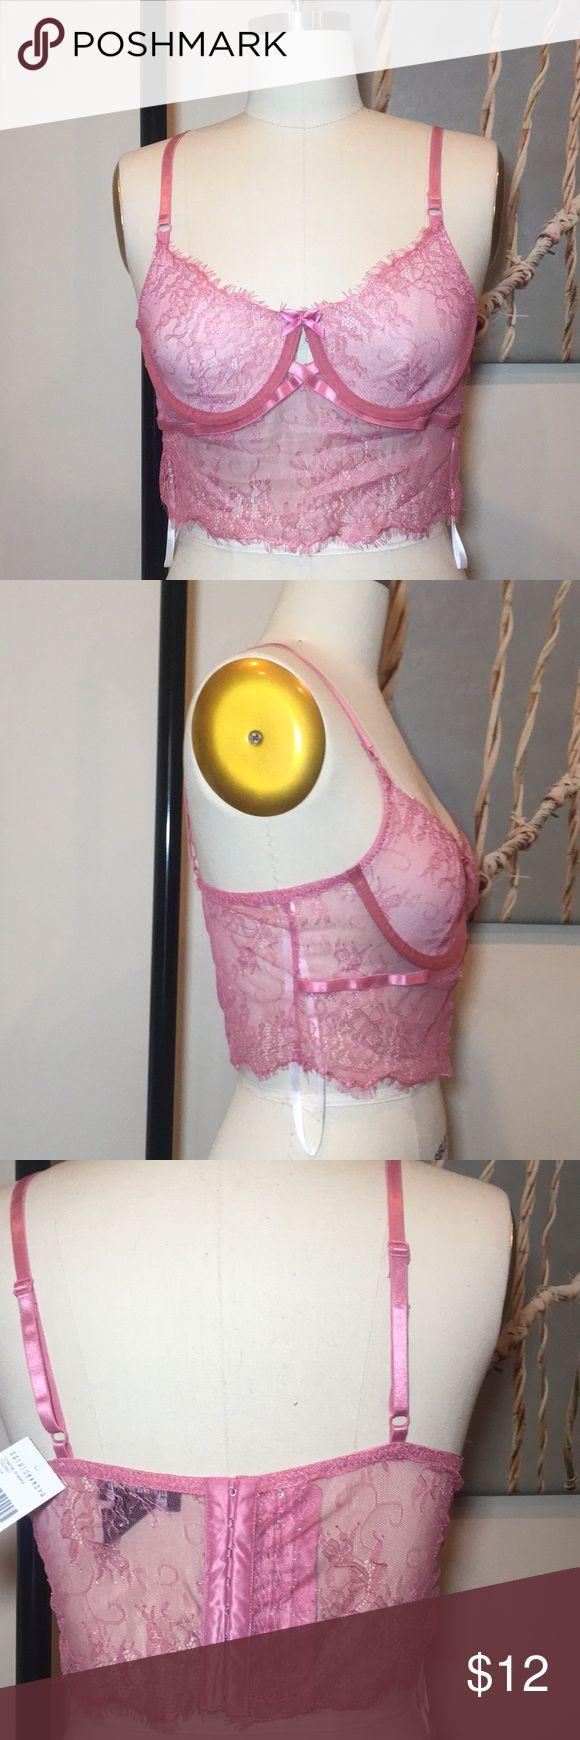 NWT lace bralette Underwire Center Keyhole Sheer Mesh Mauve  100% Polyester Fashion Nova Intimates & Sleepwear Bras